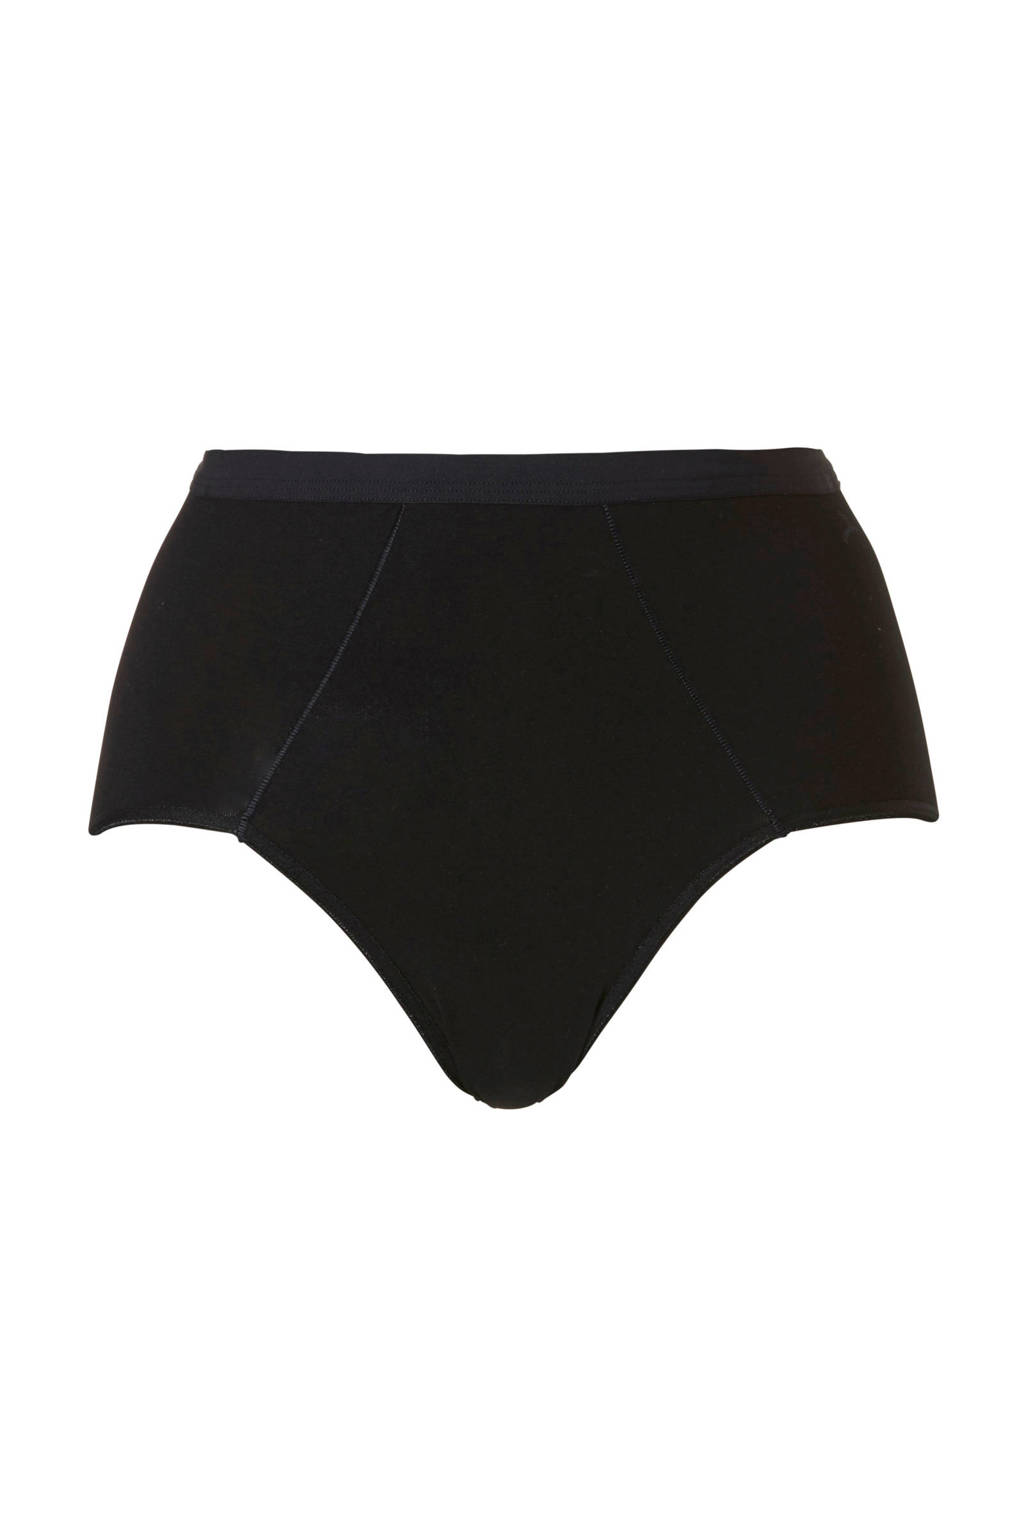 ten Cate Cotton Contour corrigerende slip zwart, Zwart